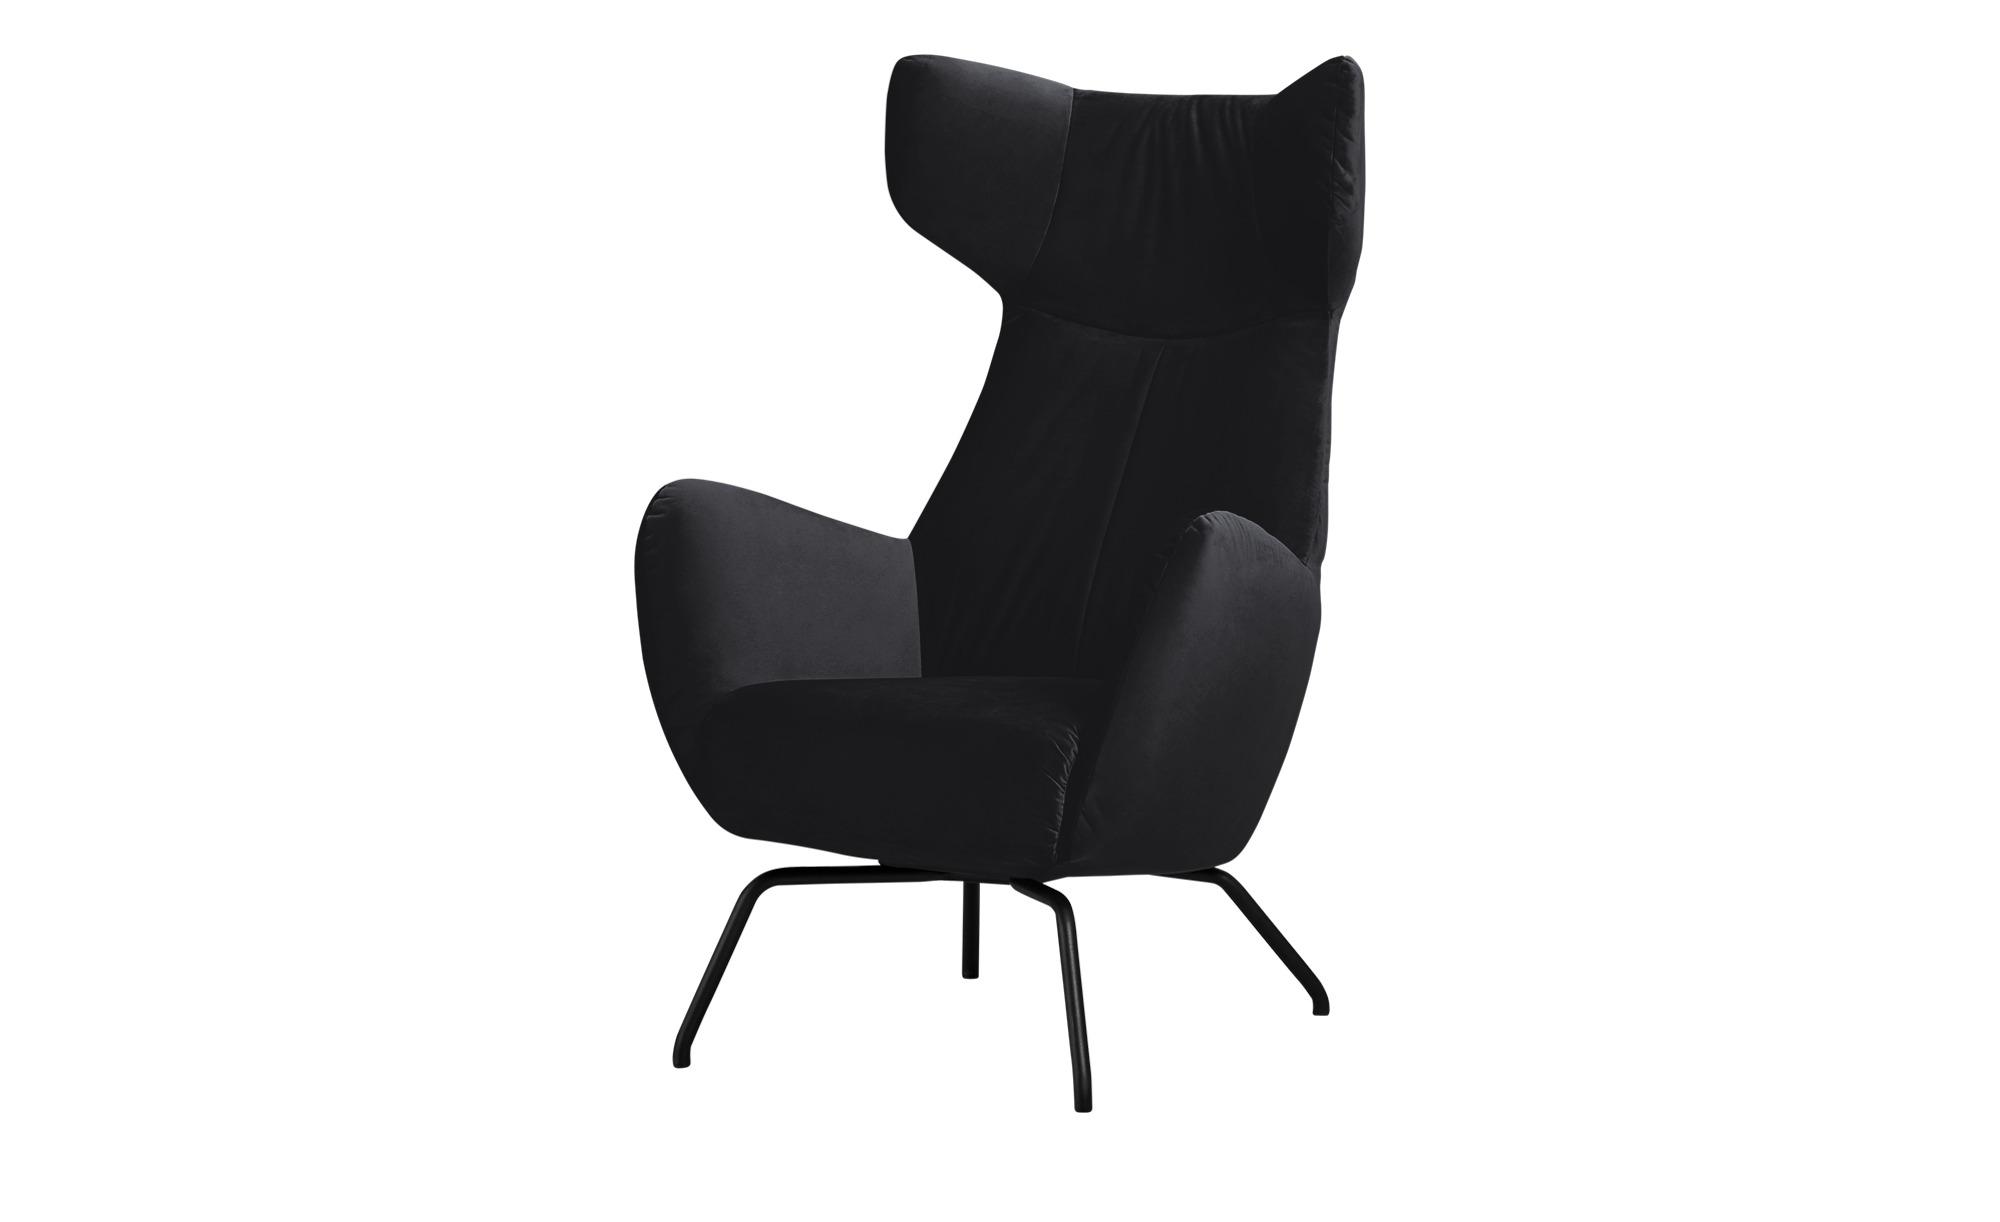 pop Sessel  Corelli ¦ schwarz ¦ Maße (cm): B: 79 H: 117 T: 82 Polstermöbel > Sessel > Polstersessel - Höffner